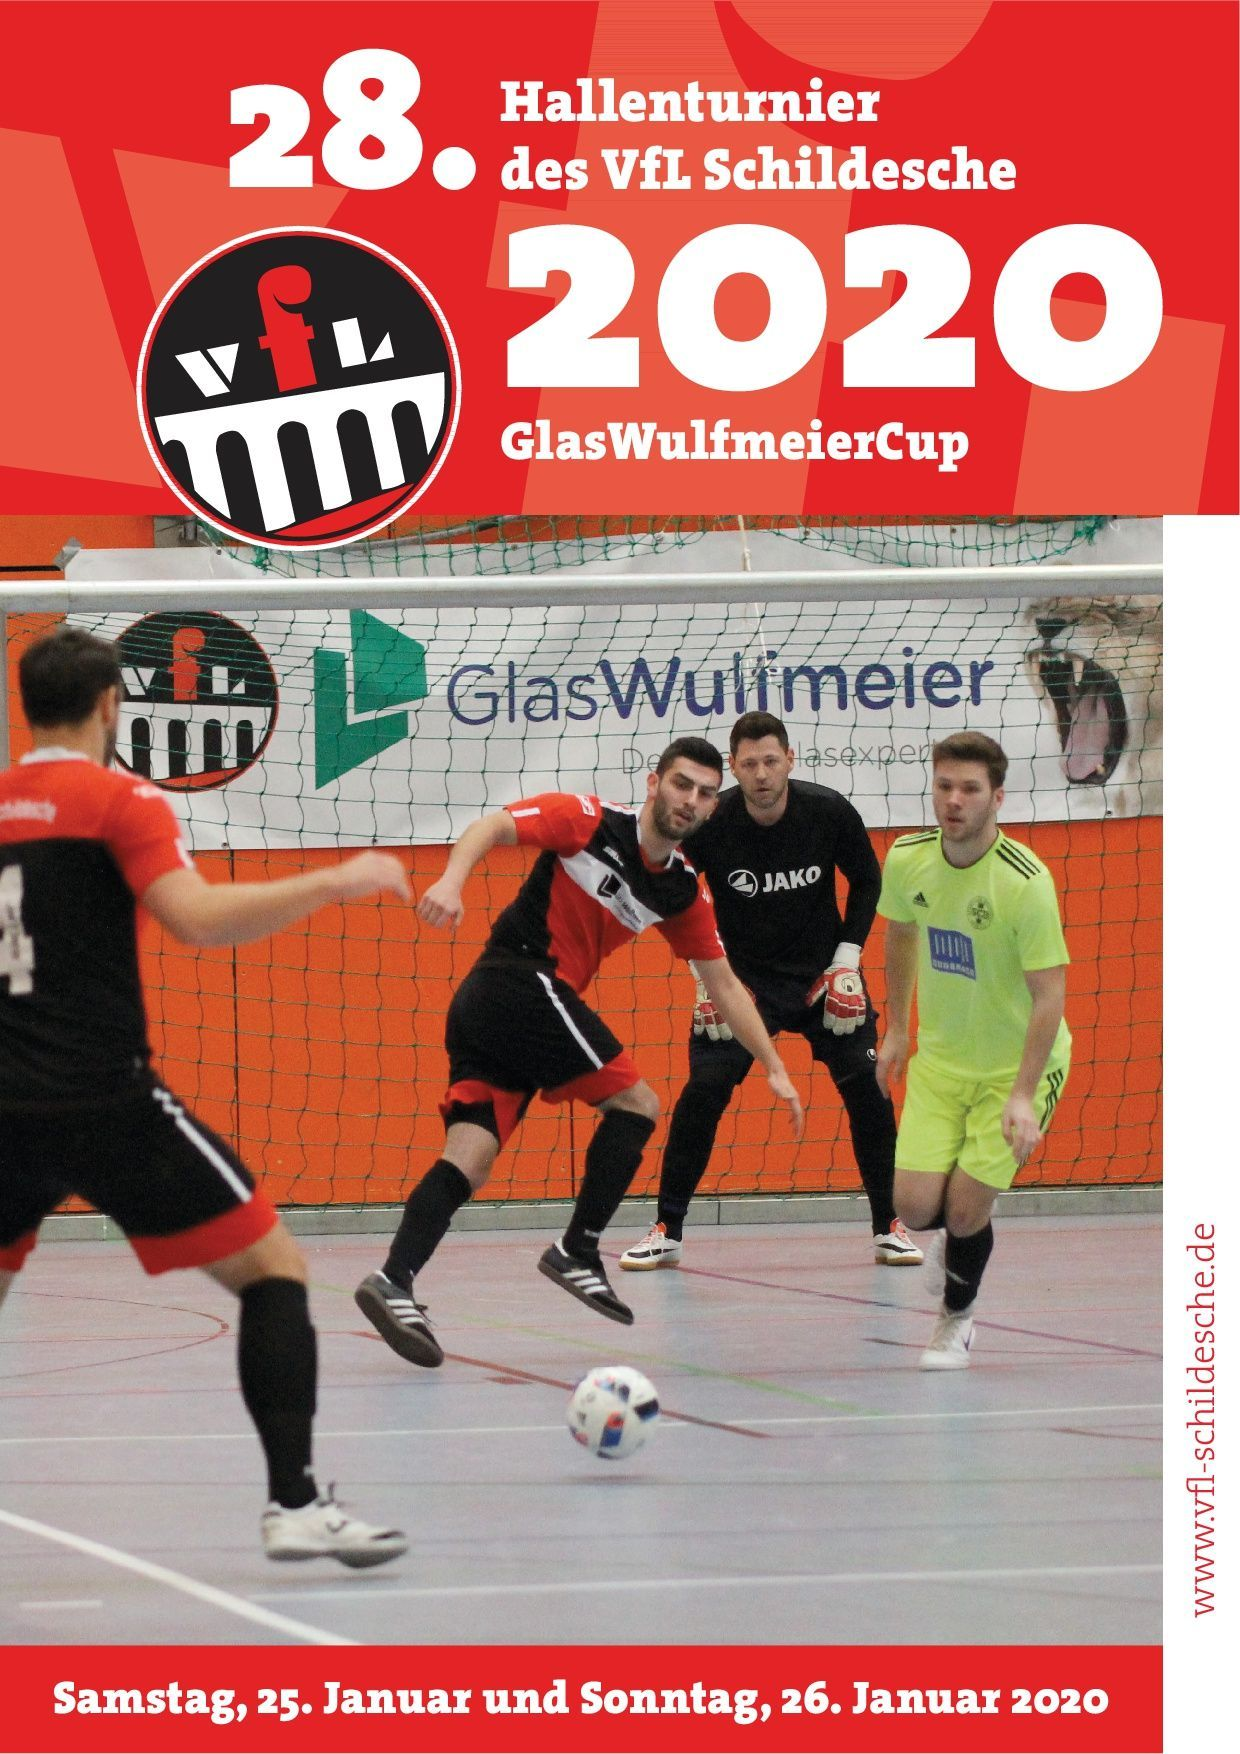 Glas Wulfmeier Cup 2020 - Glas Wulfmeier Cup